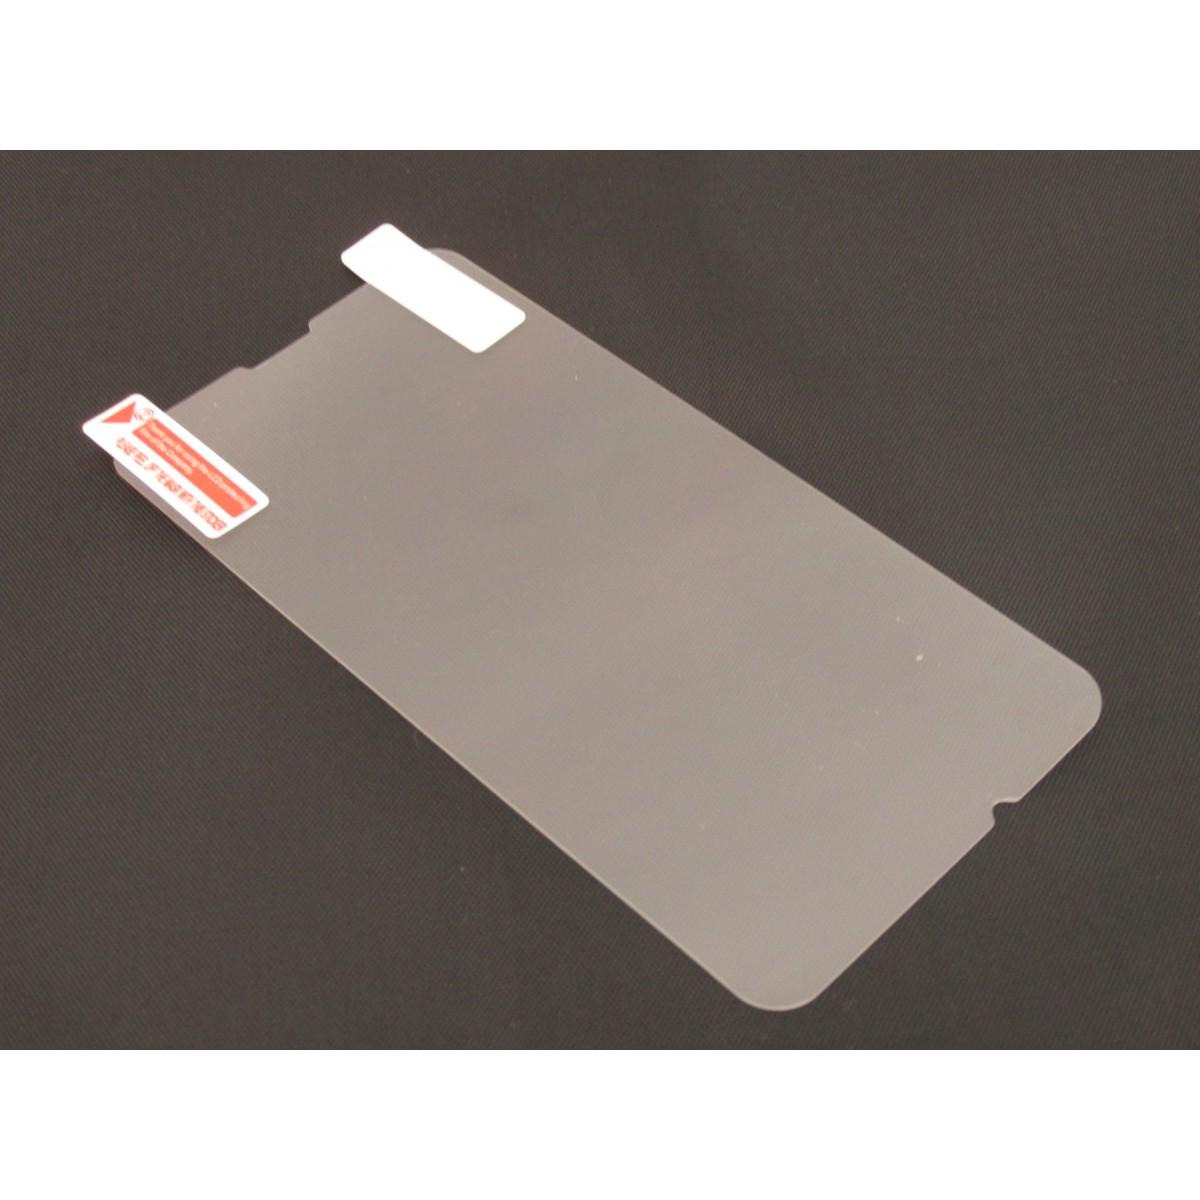 Pelicula Protetora Nokia Lumia 630 635 N630 N635 Fosca